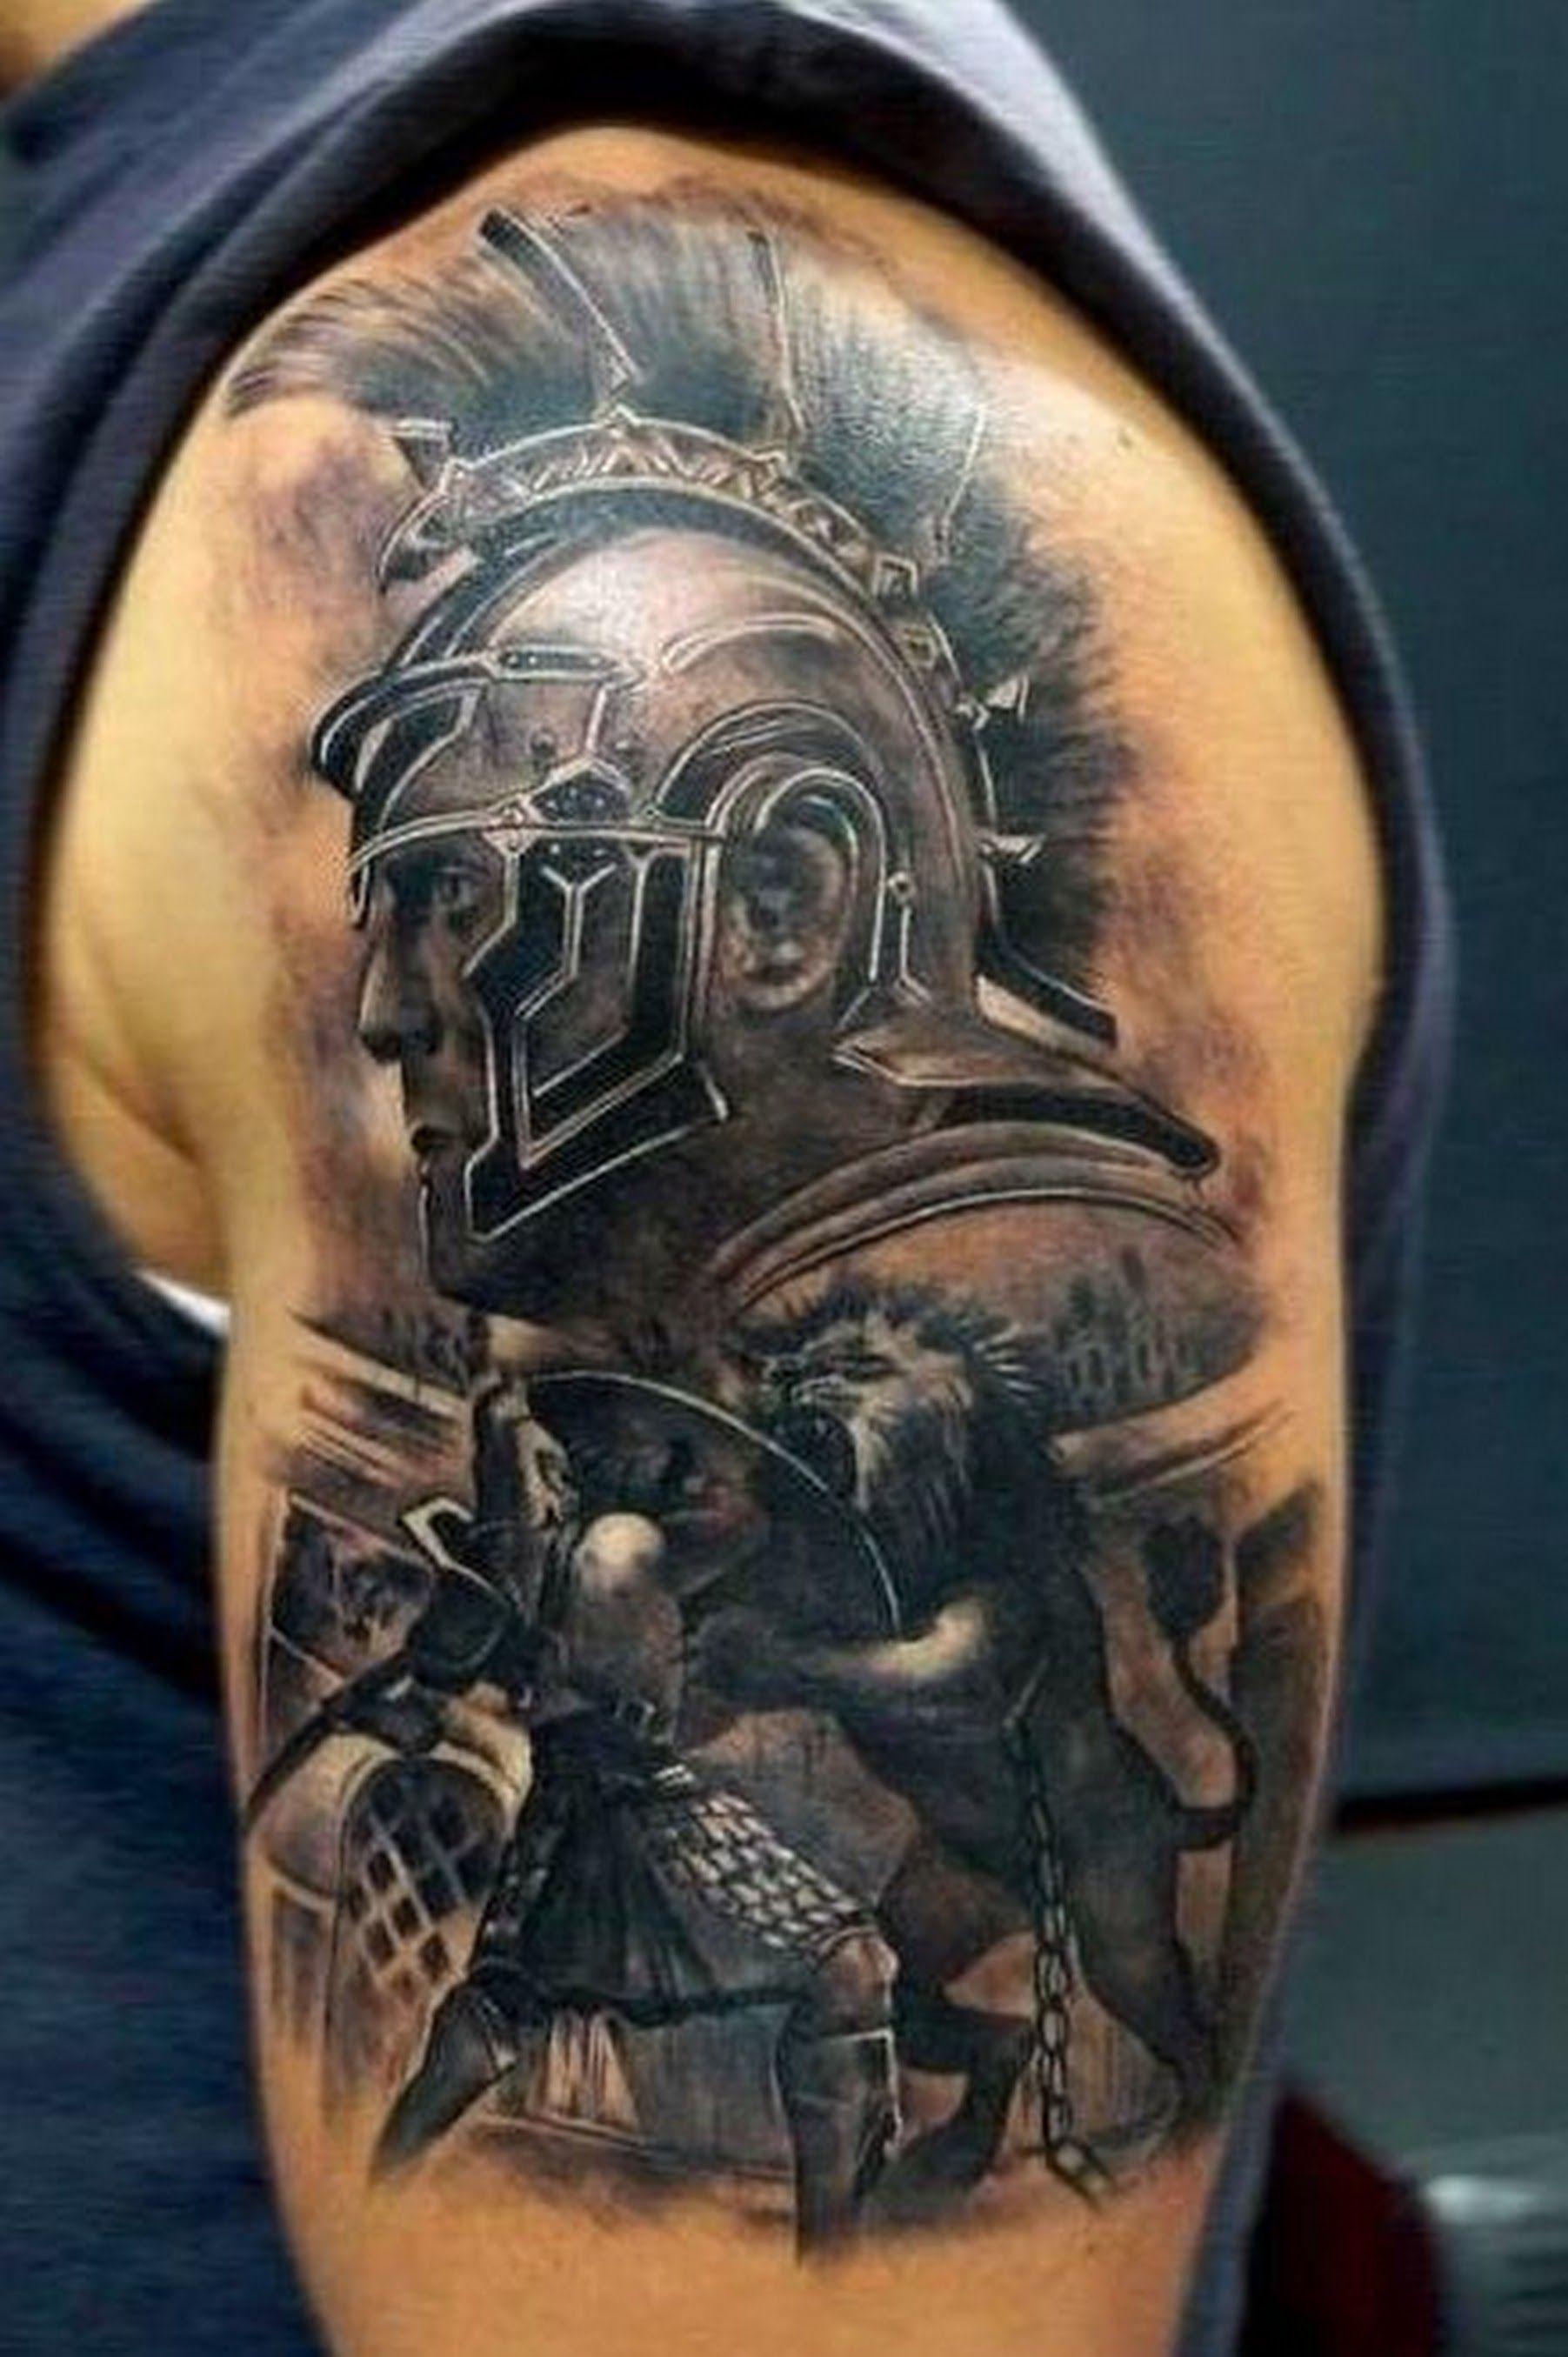 Epingle Par Ricci Sur Idee Tatoo Rome Tatouage Tatouage